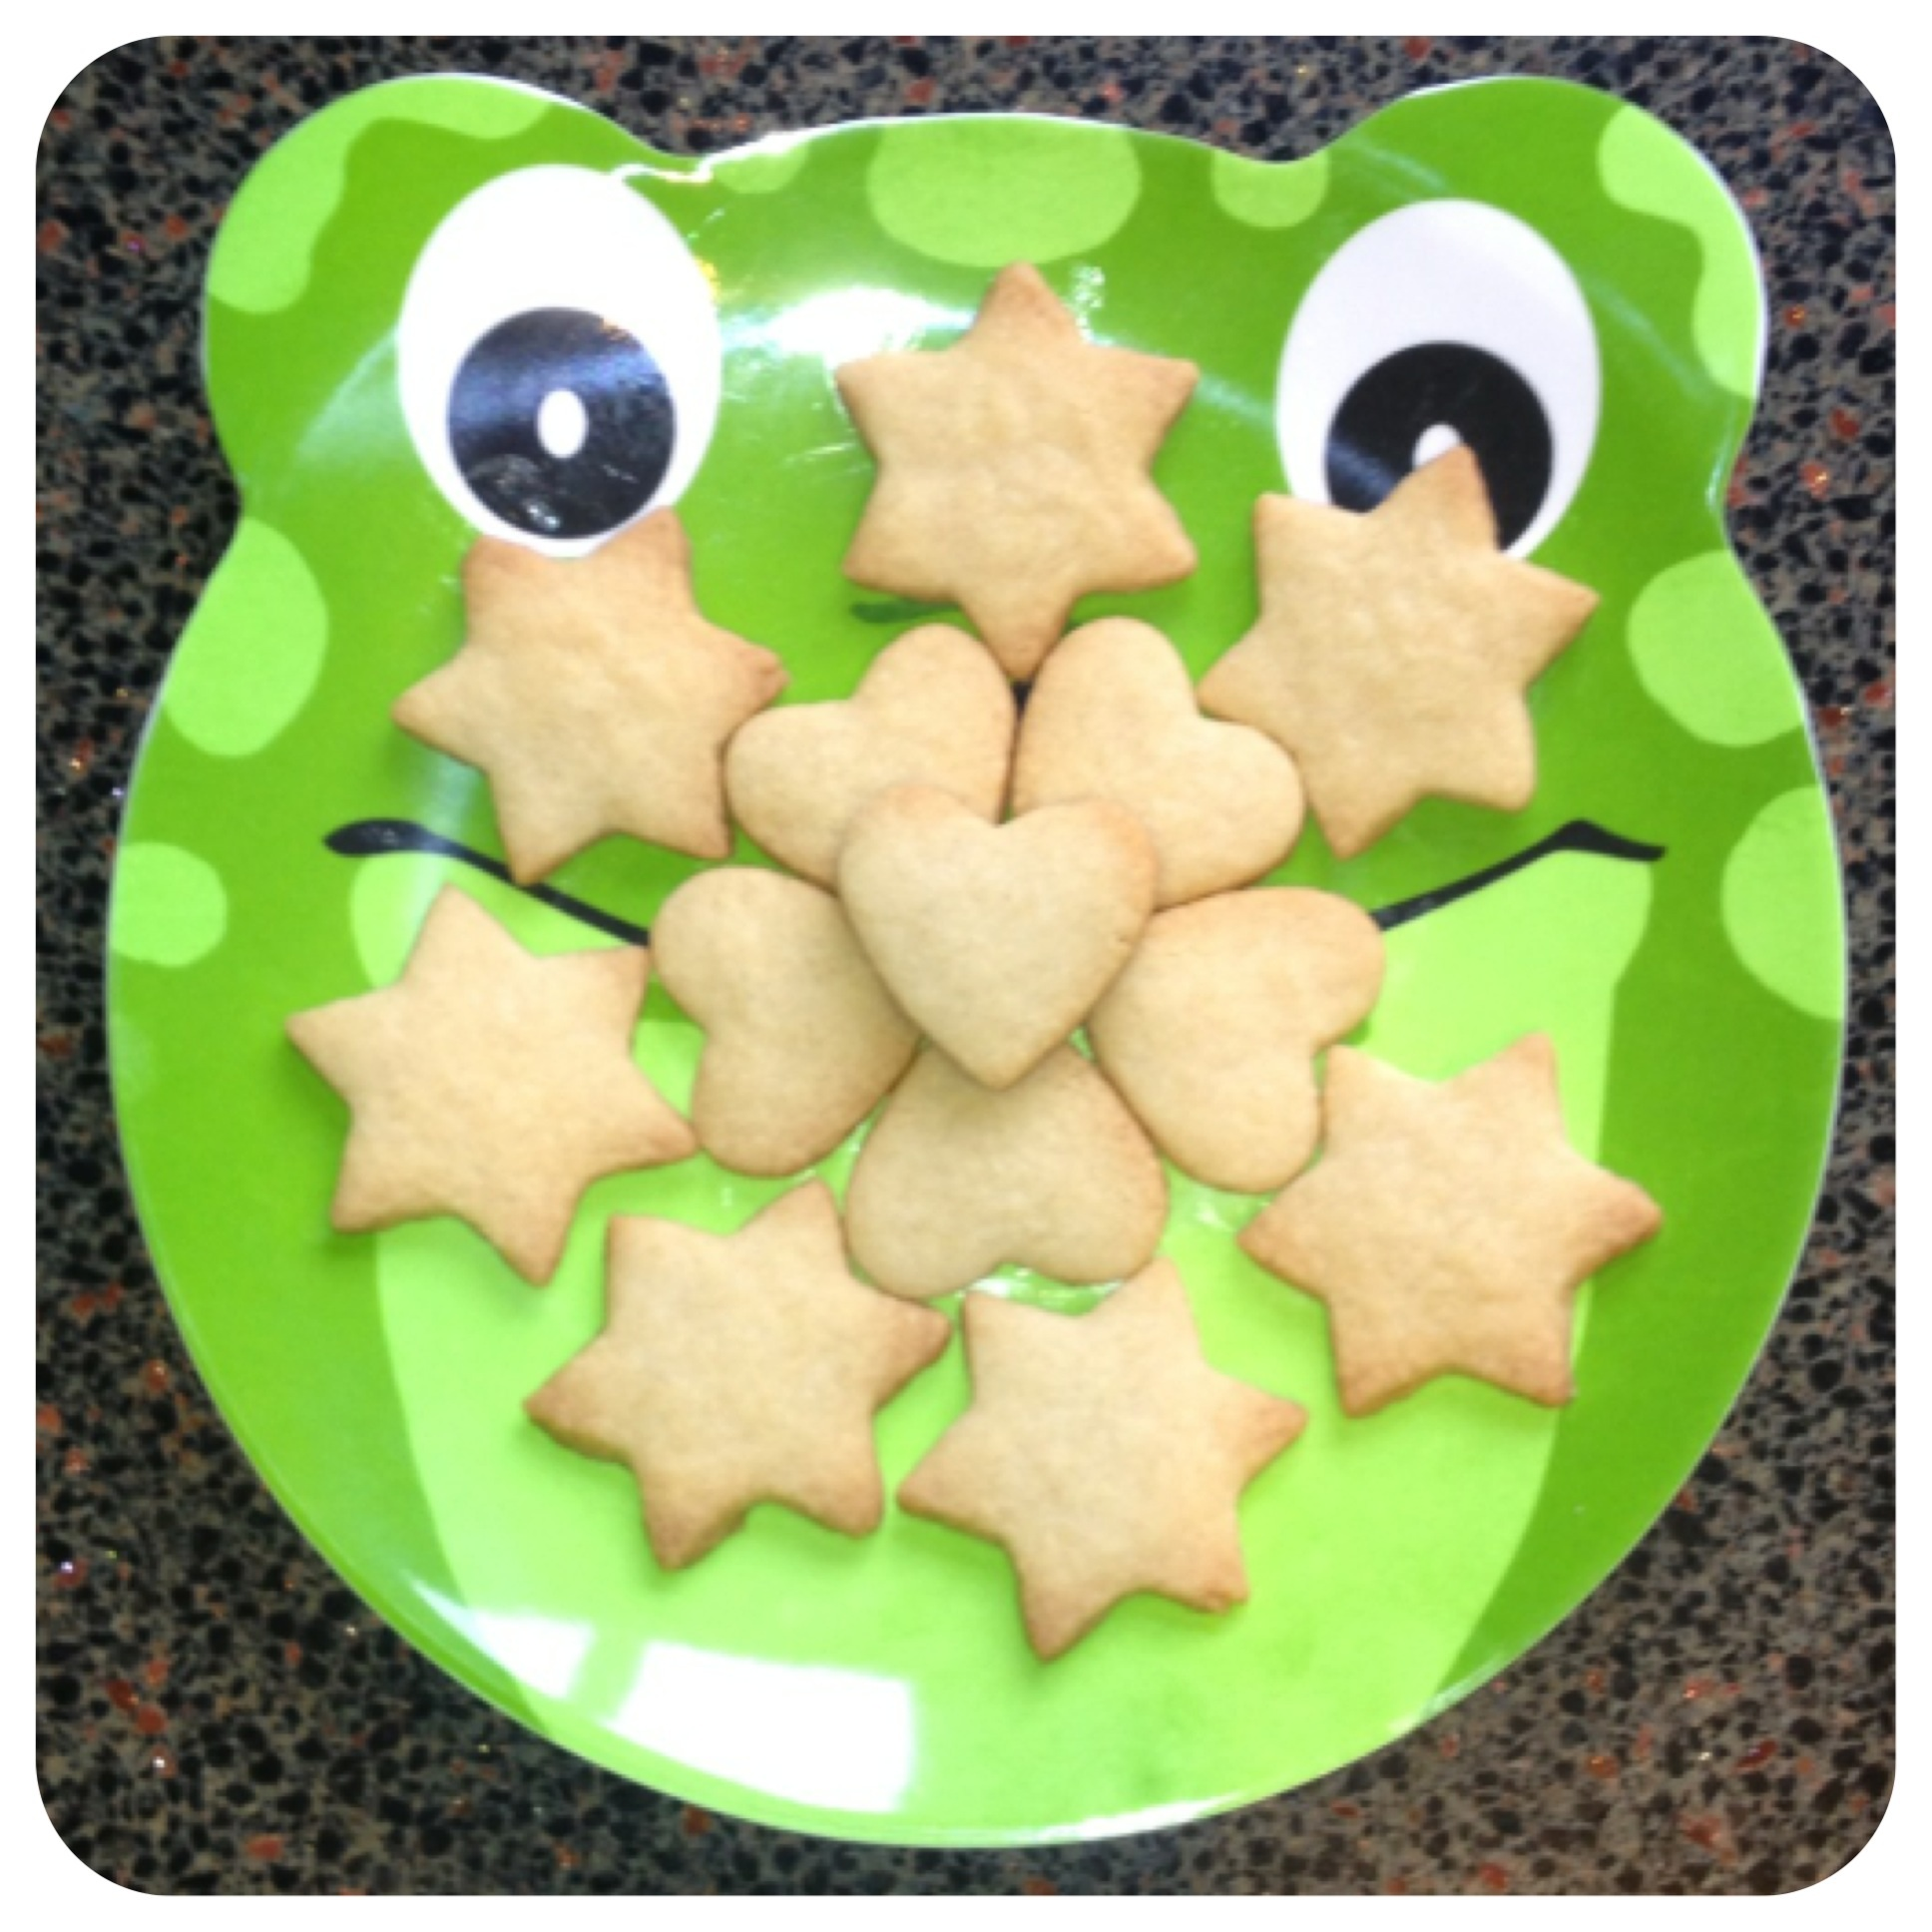 Kiddies shortbread on a frog!